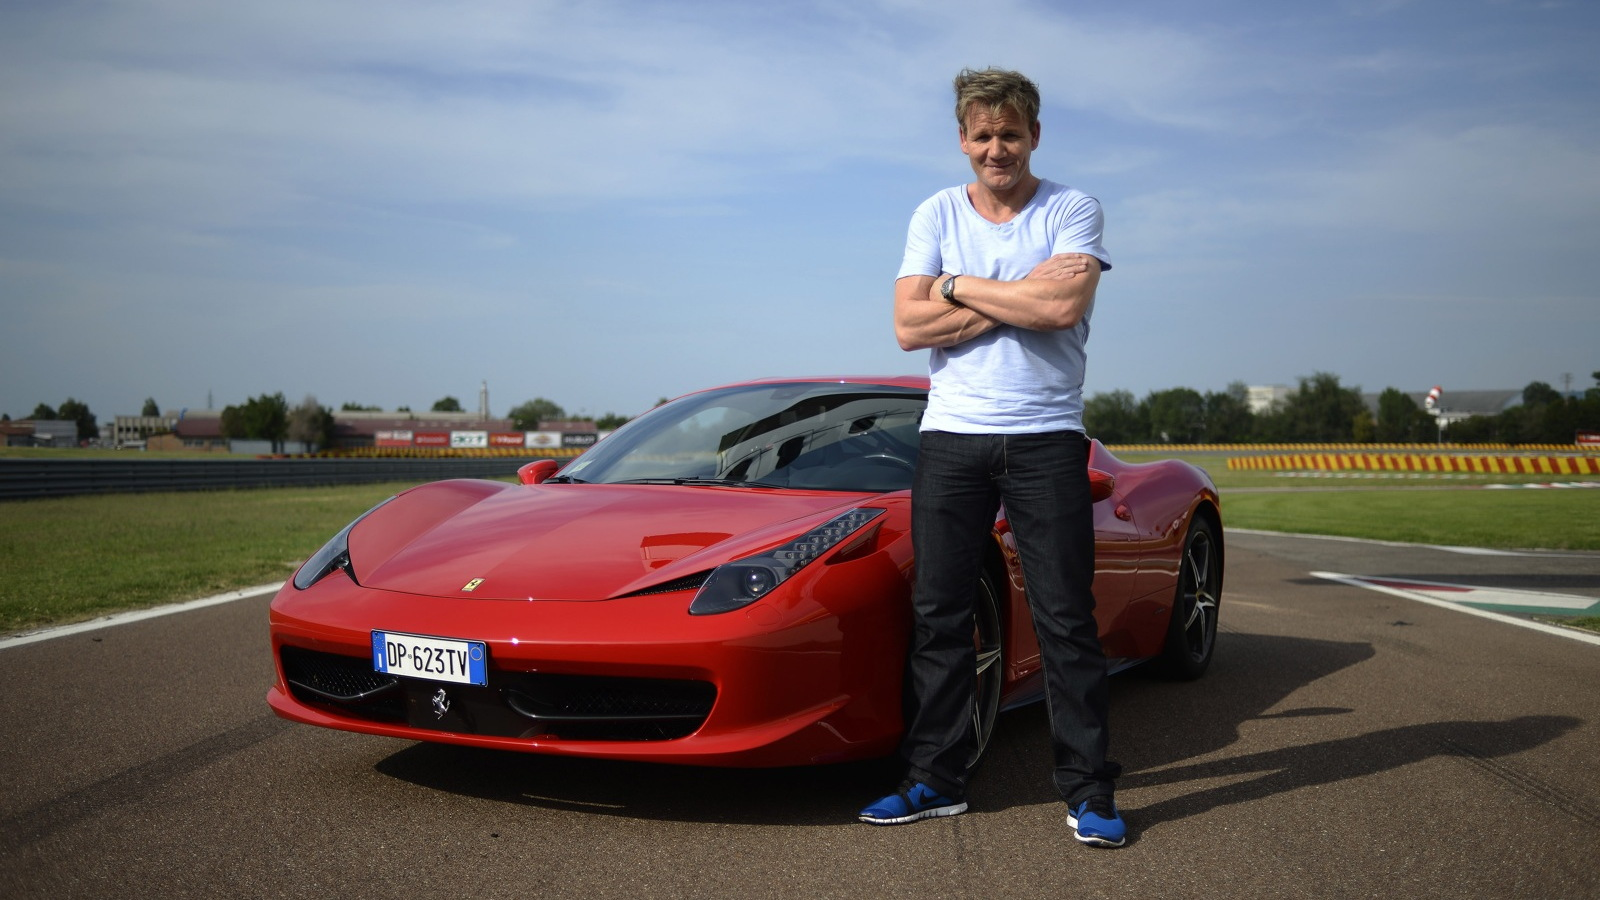 Gordon Ramsay tours Ferrari